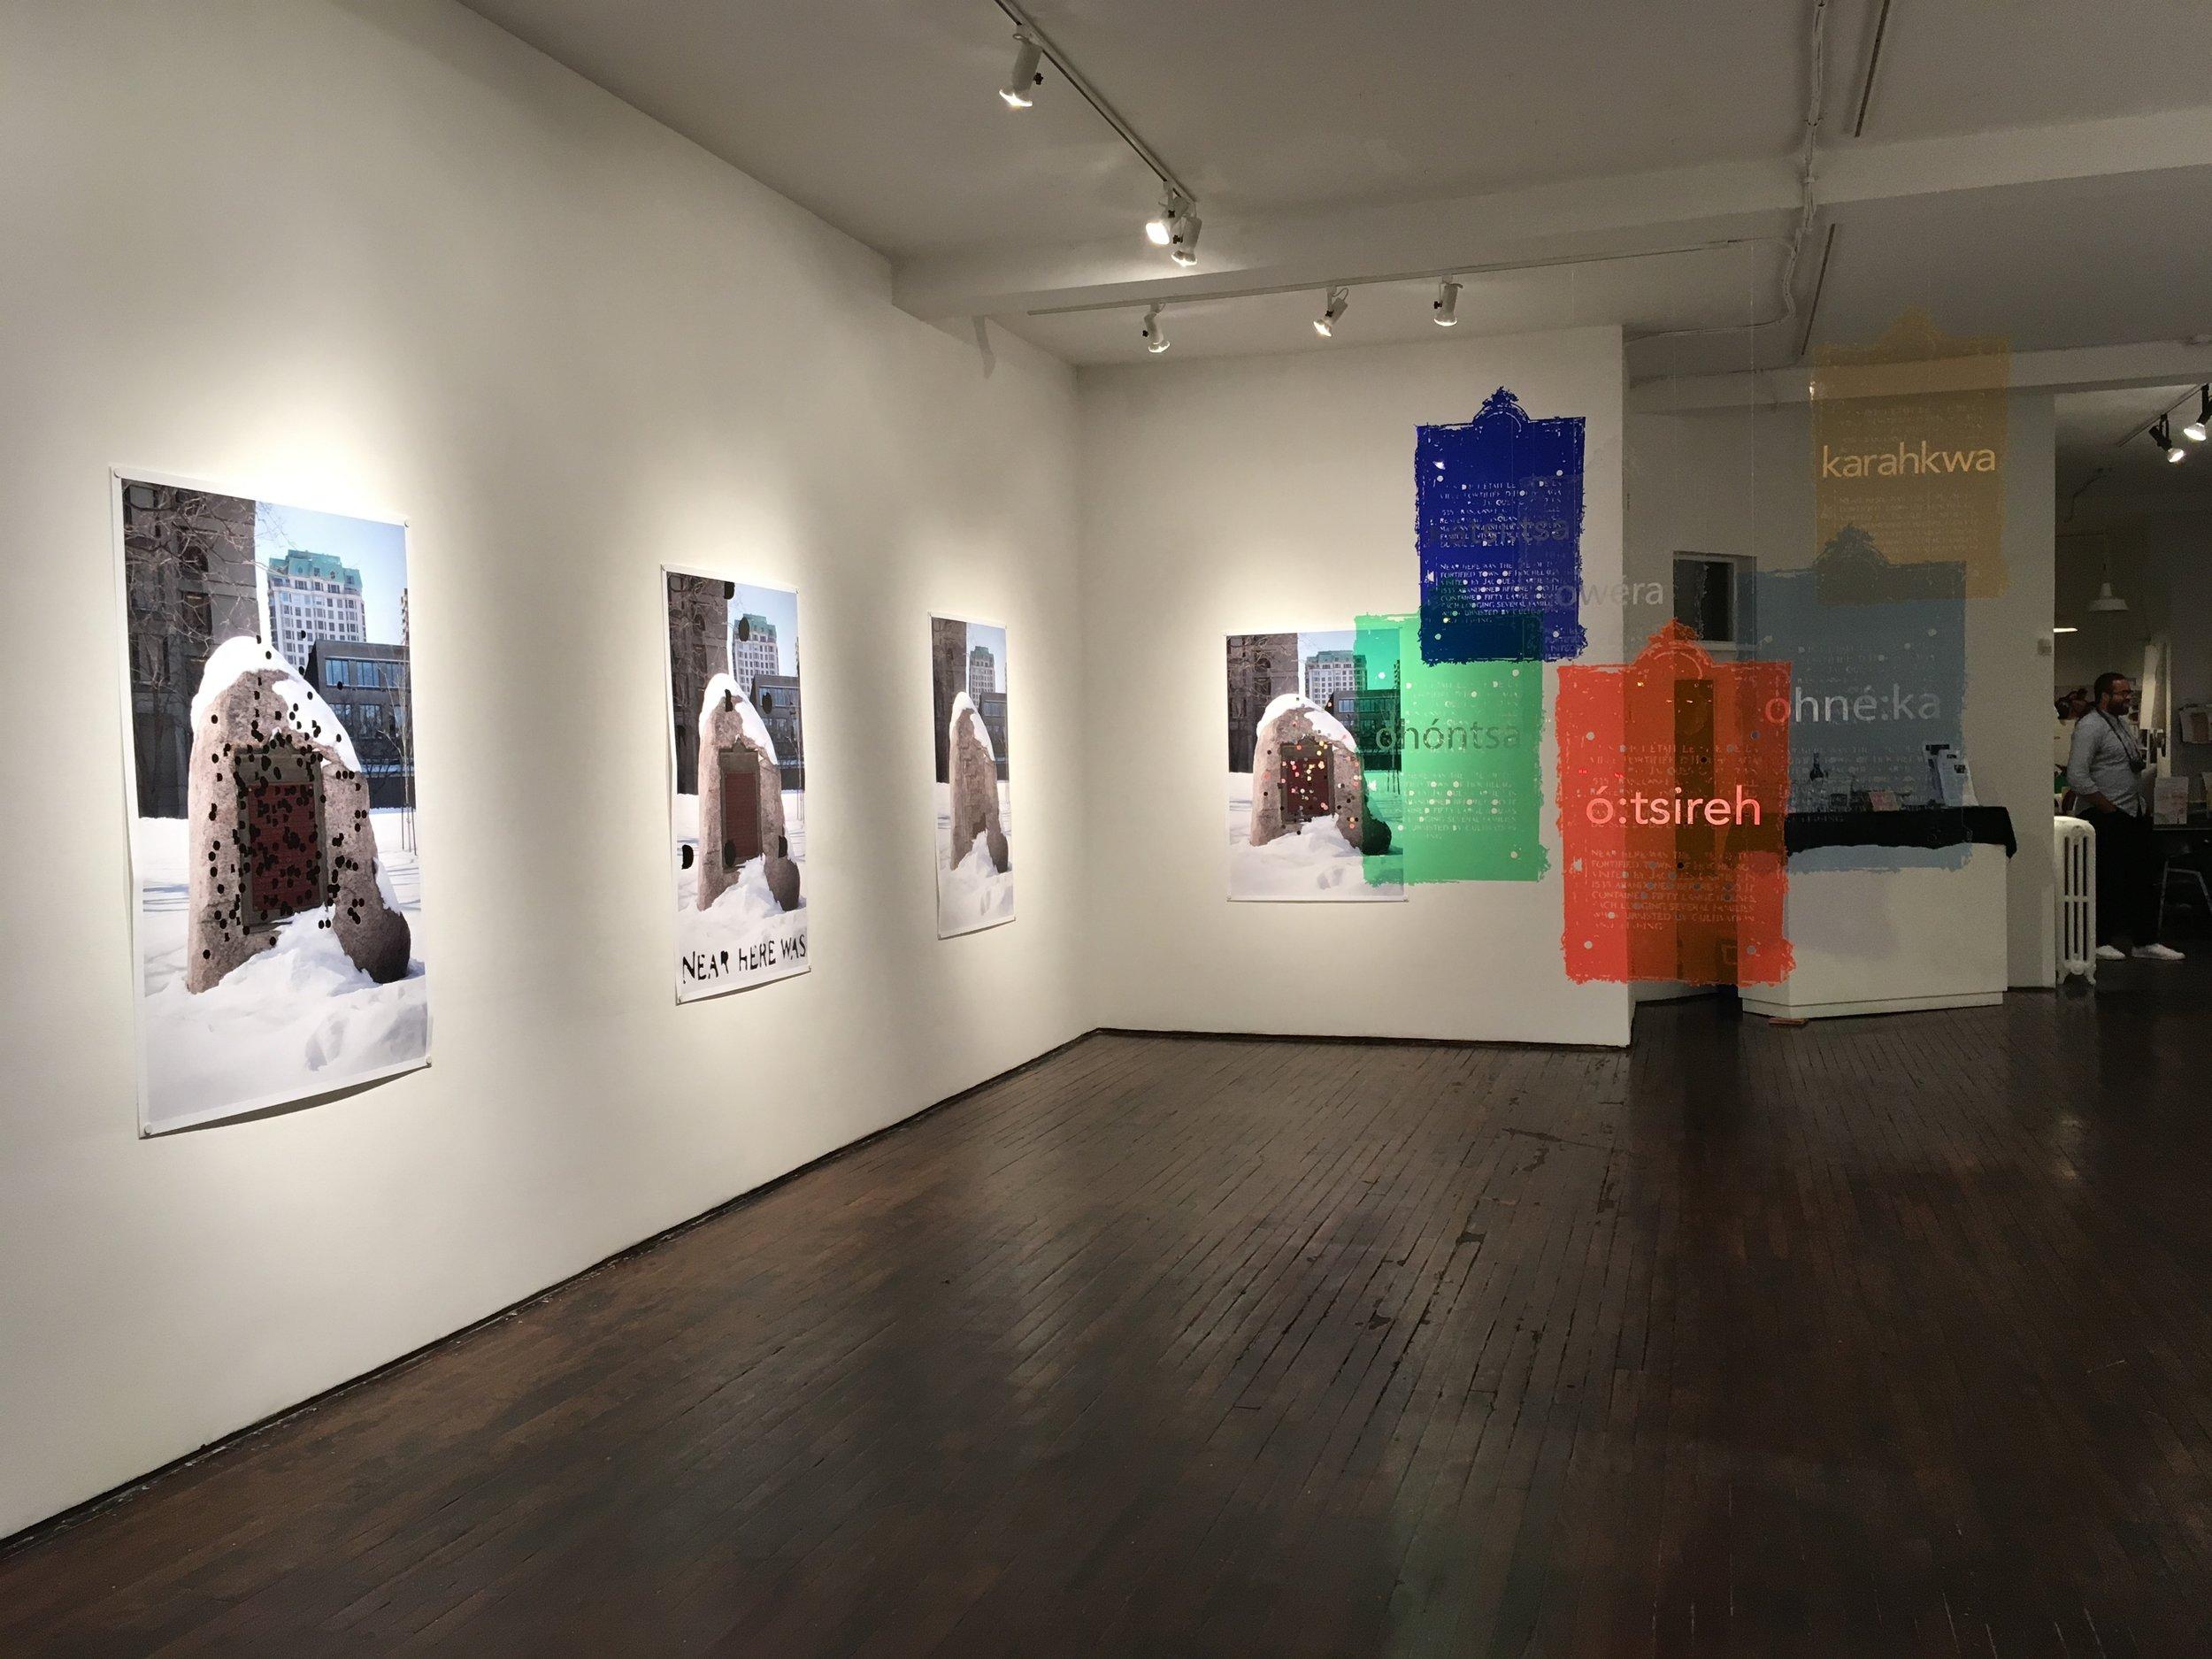 Hannah Claus, hochelaga rock exhibition (installation view at articule), 2017